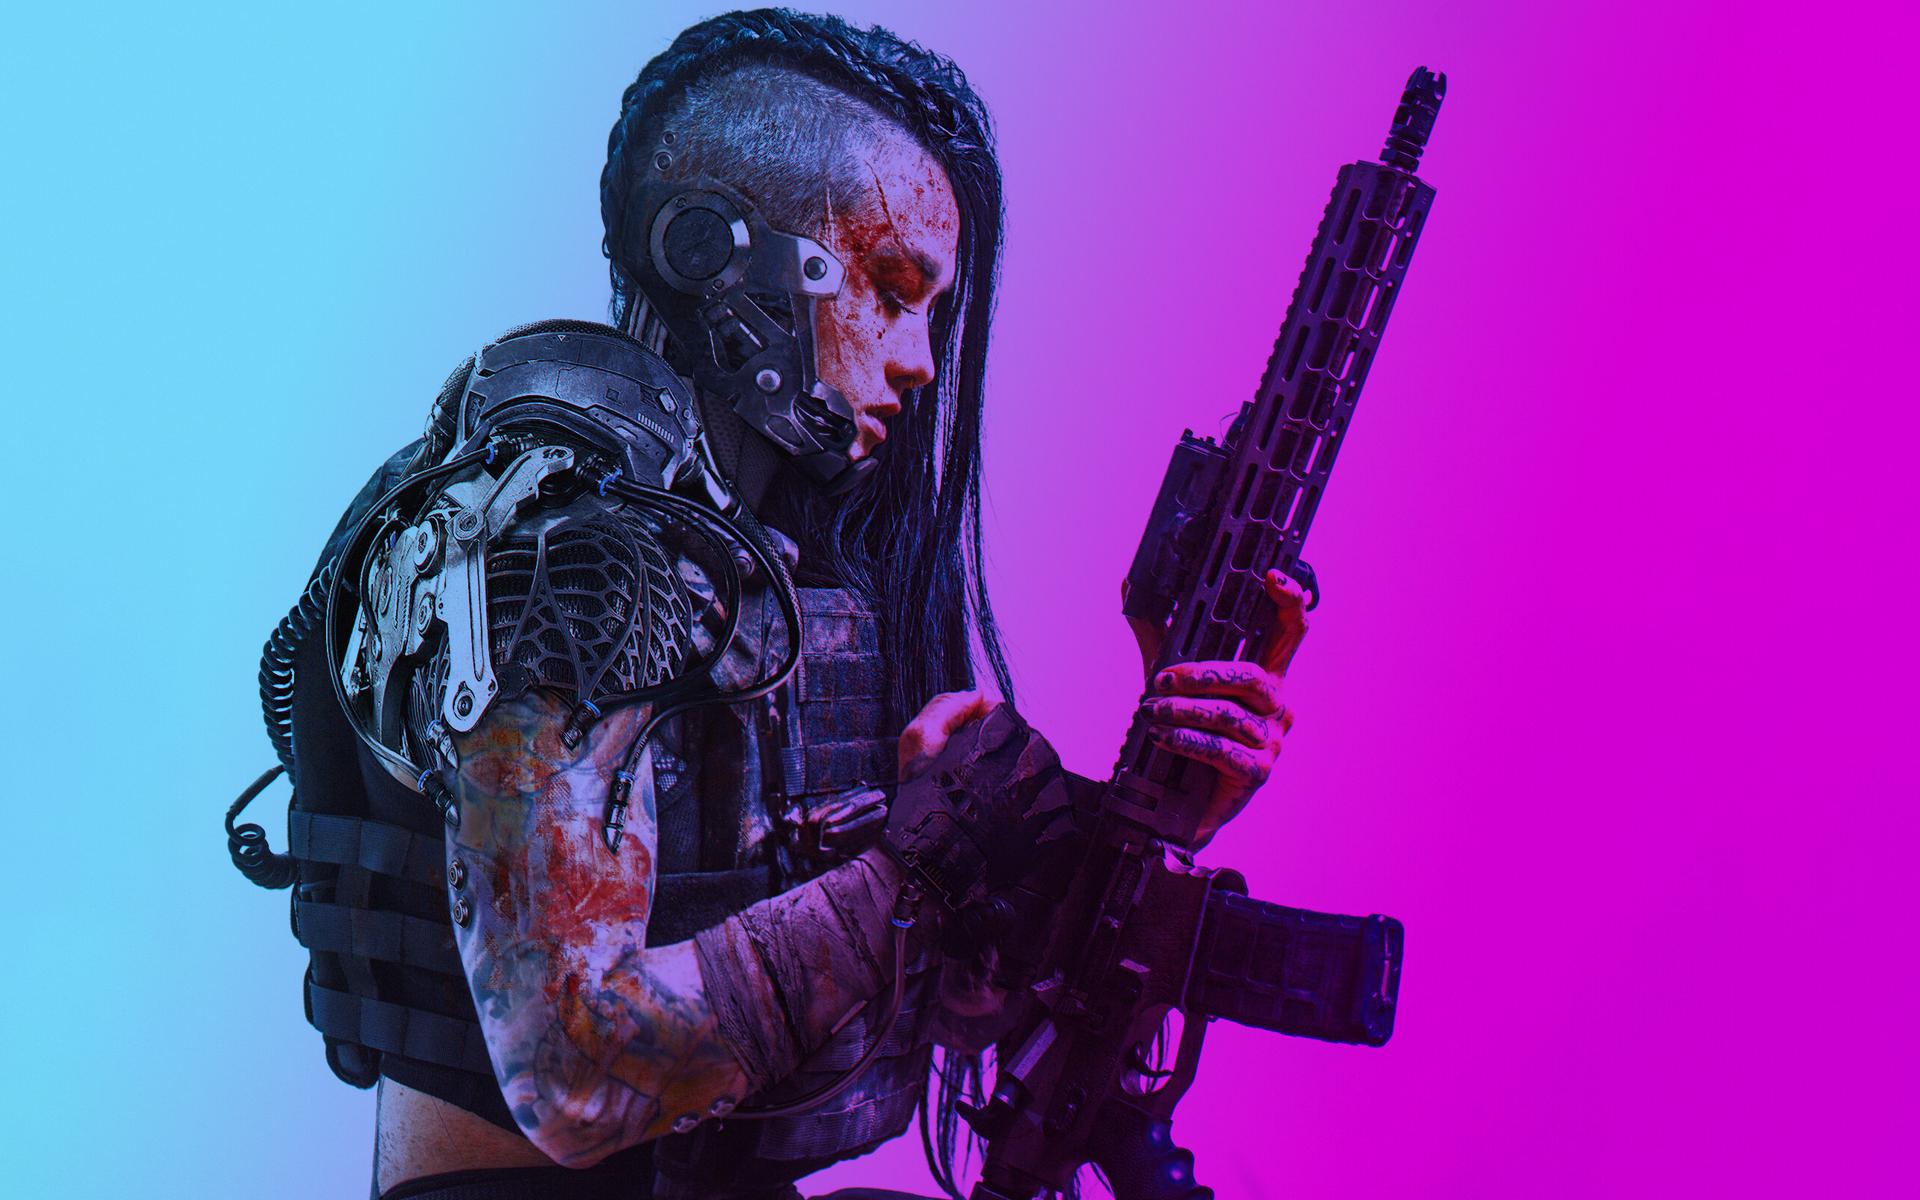 Cyberpunk Sci Fi Gun Concept Art